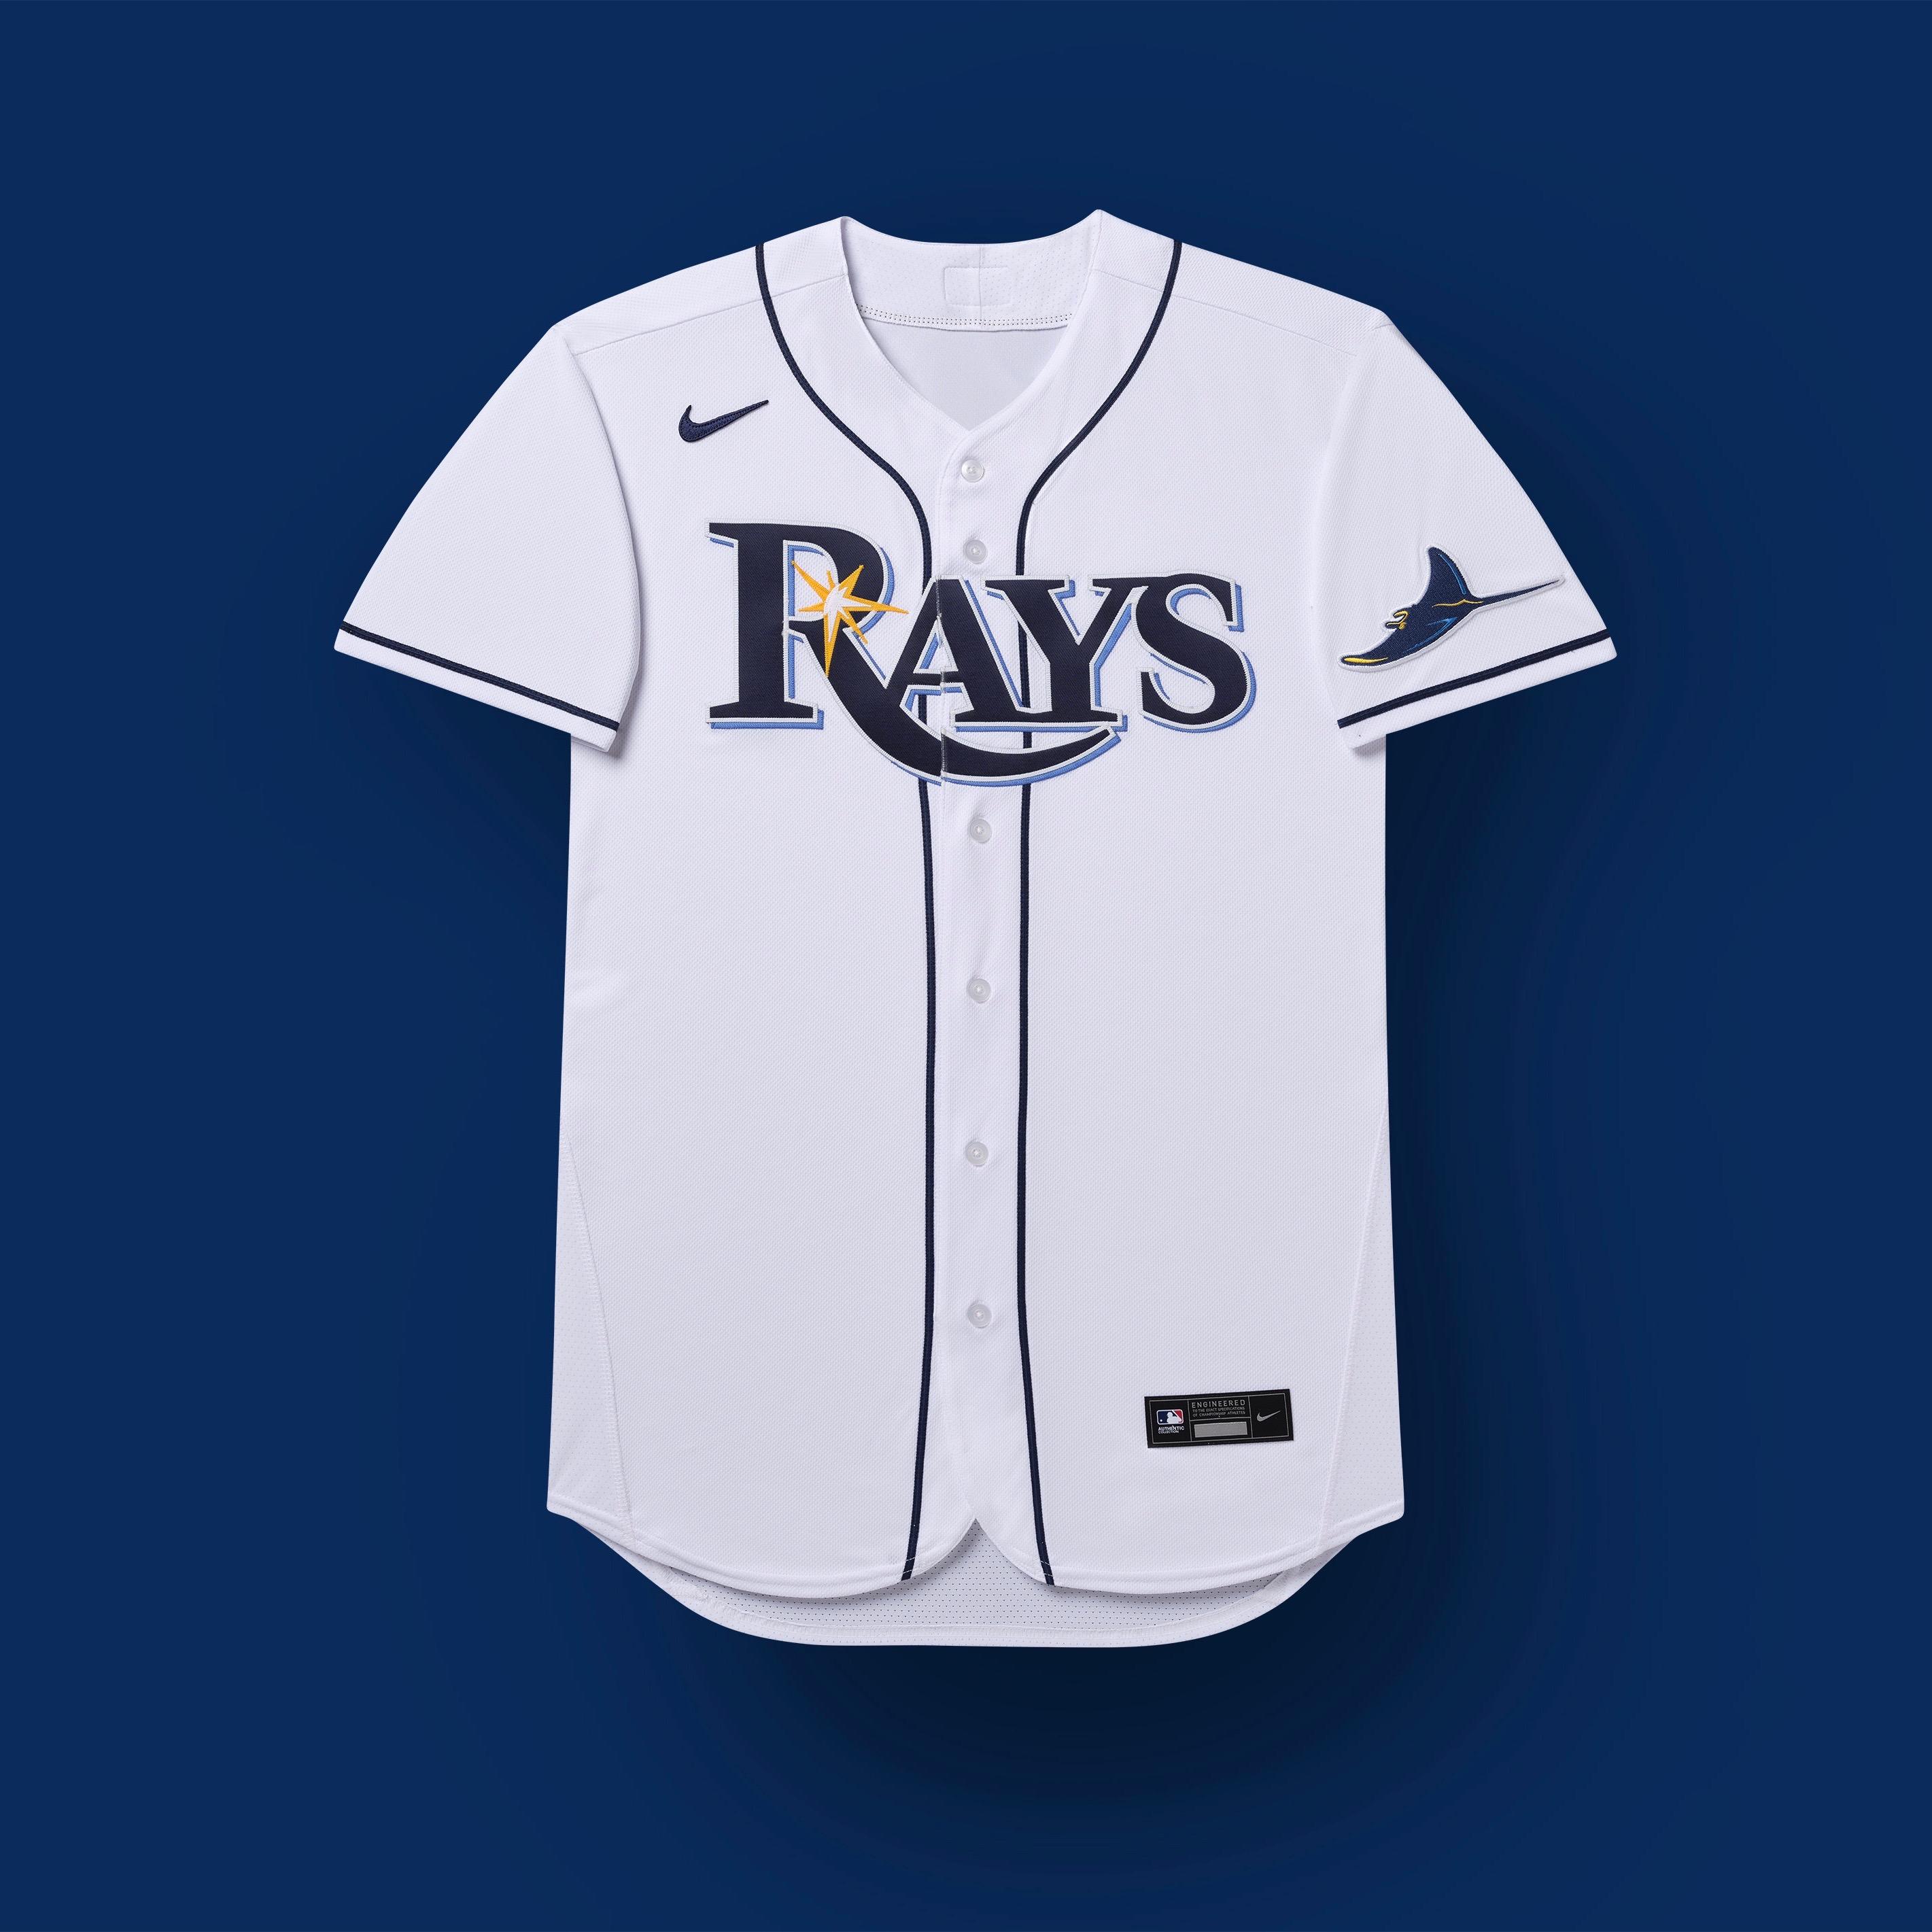 tampa bay rays 2020 uniforms